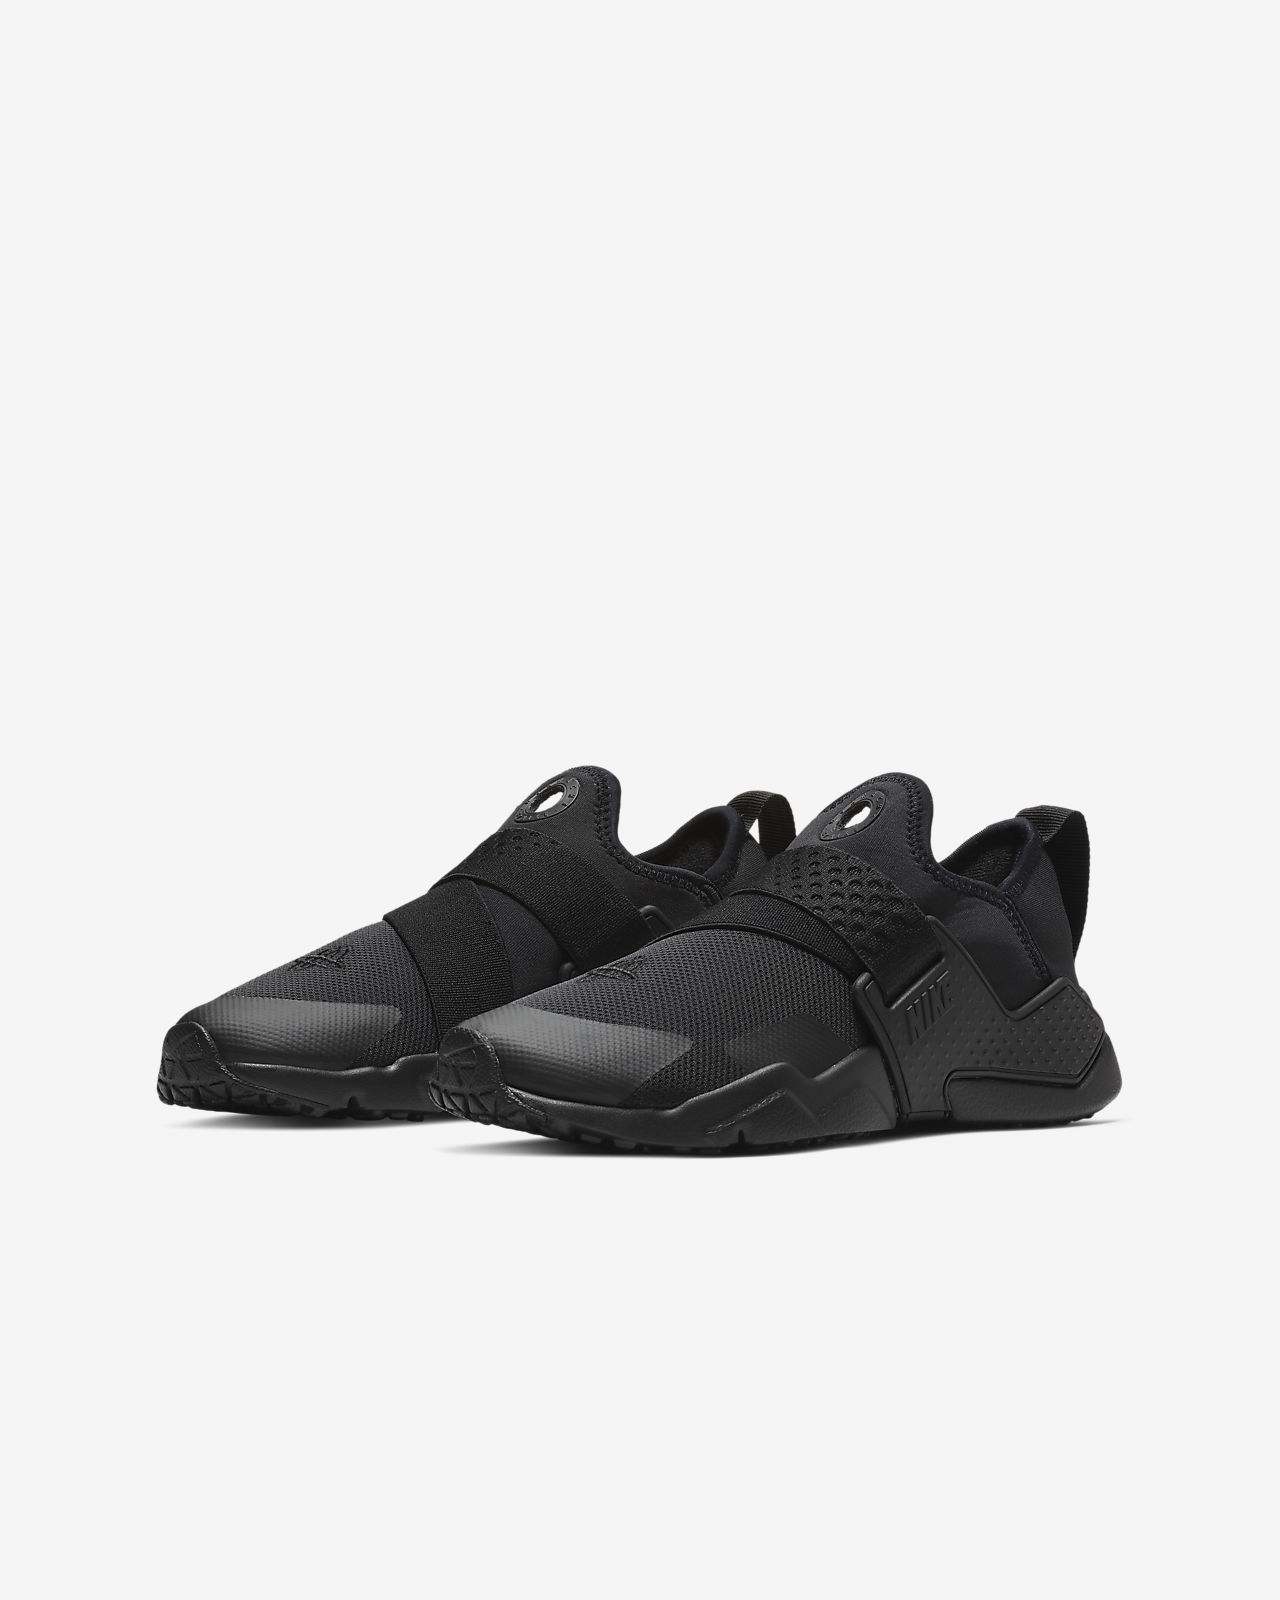 reputable site 6d2cb 42734 ... Nike Huarache Extreme Big Kids Shoe